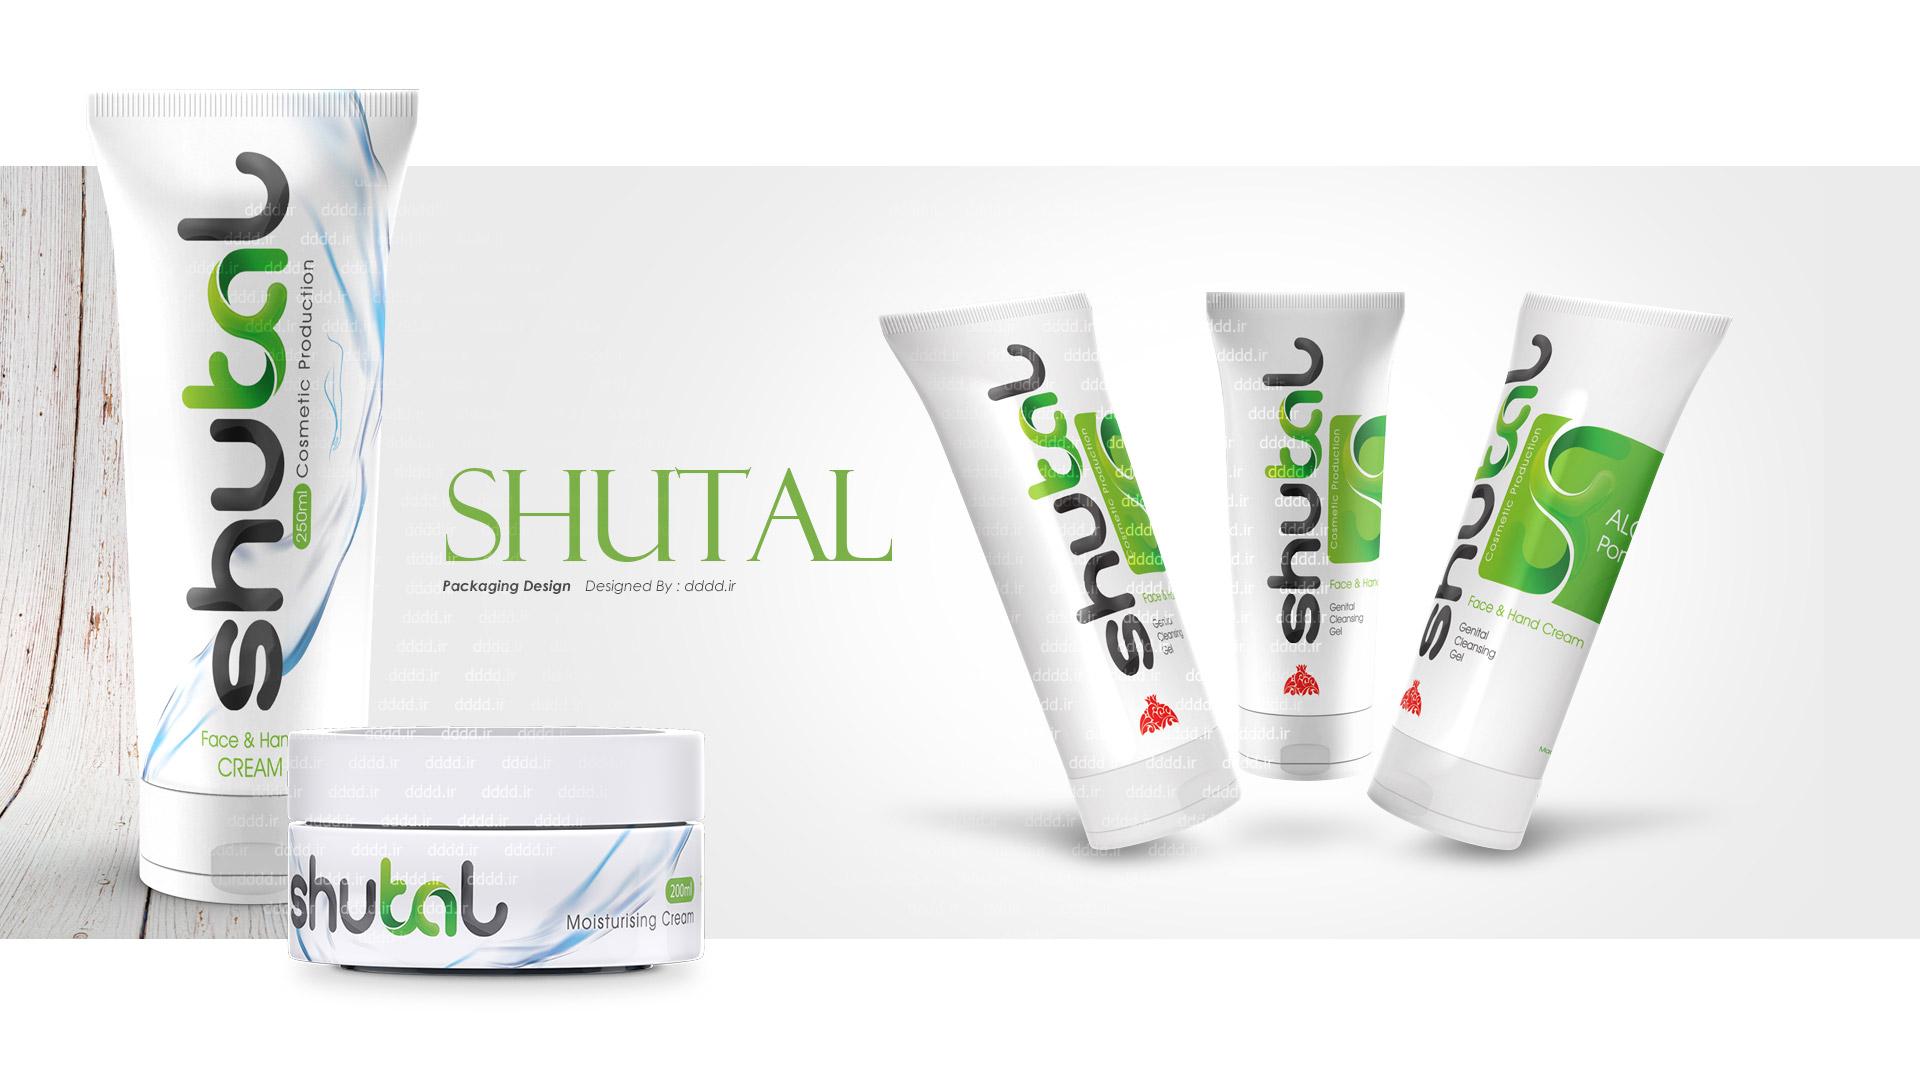 طراحی بسته بندی لوازم آرایشی بهداشتی شوتال